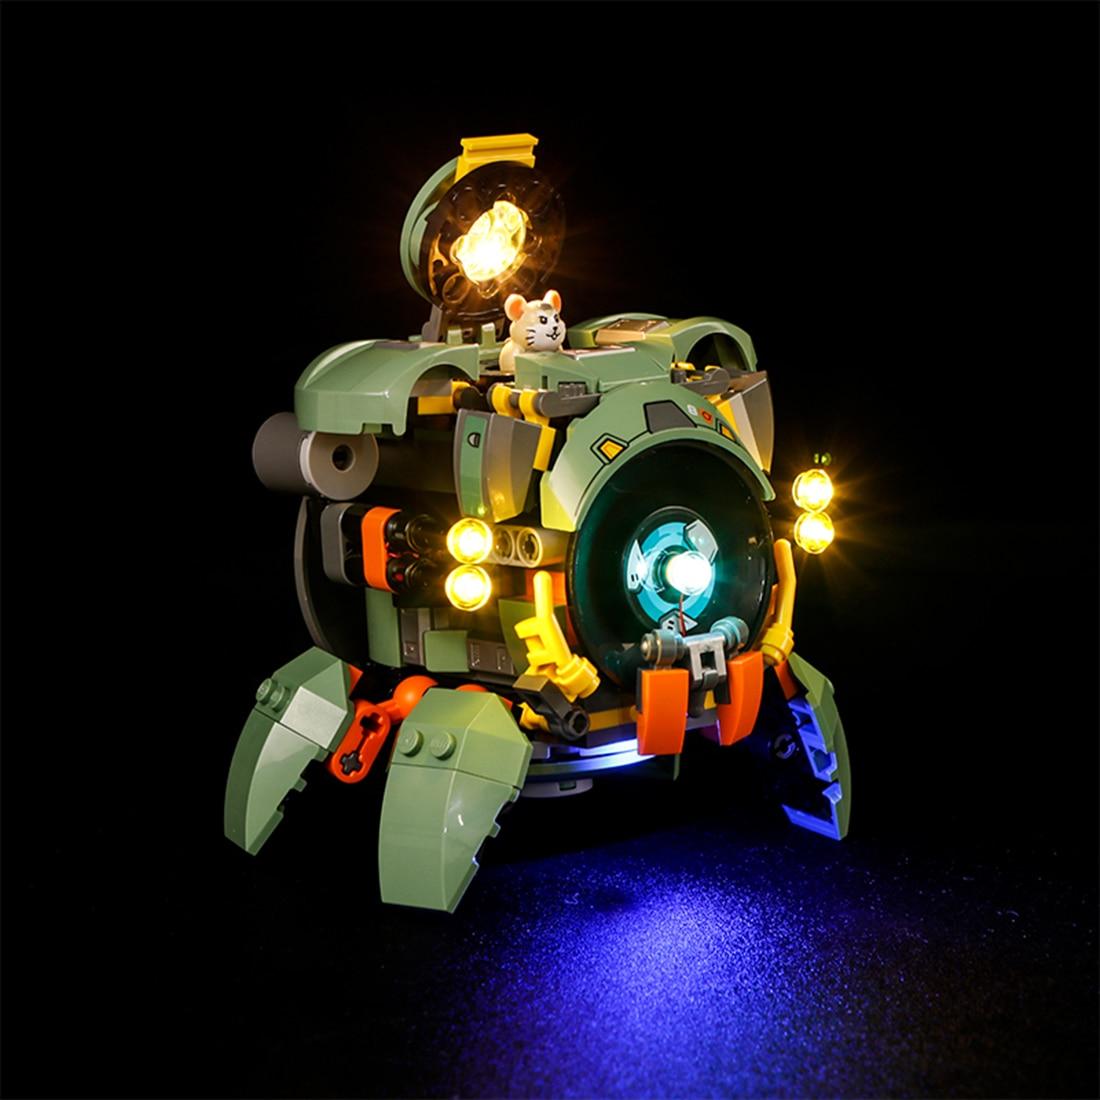 Vonado USB LED Lighting Kit For Overwatch Wrecking Ball 75976(LED Included Only, No Kit) Toy For Children Educational Toys Gift 5